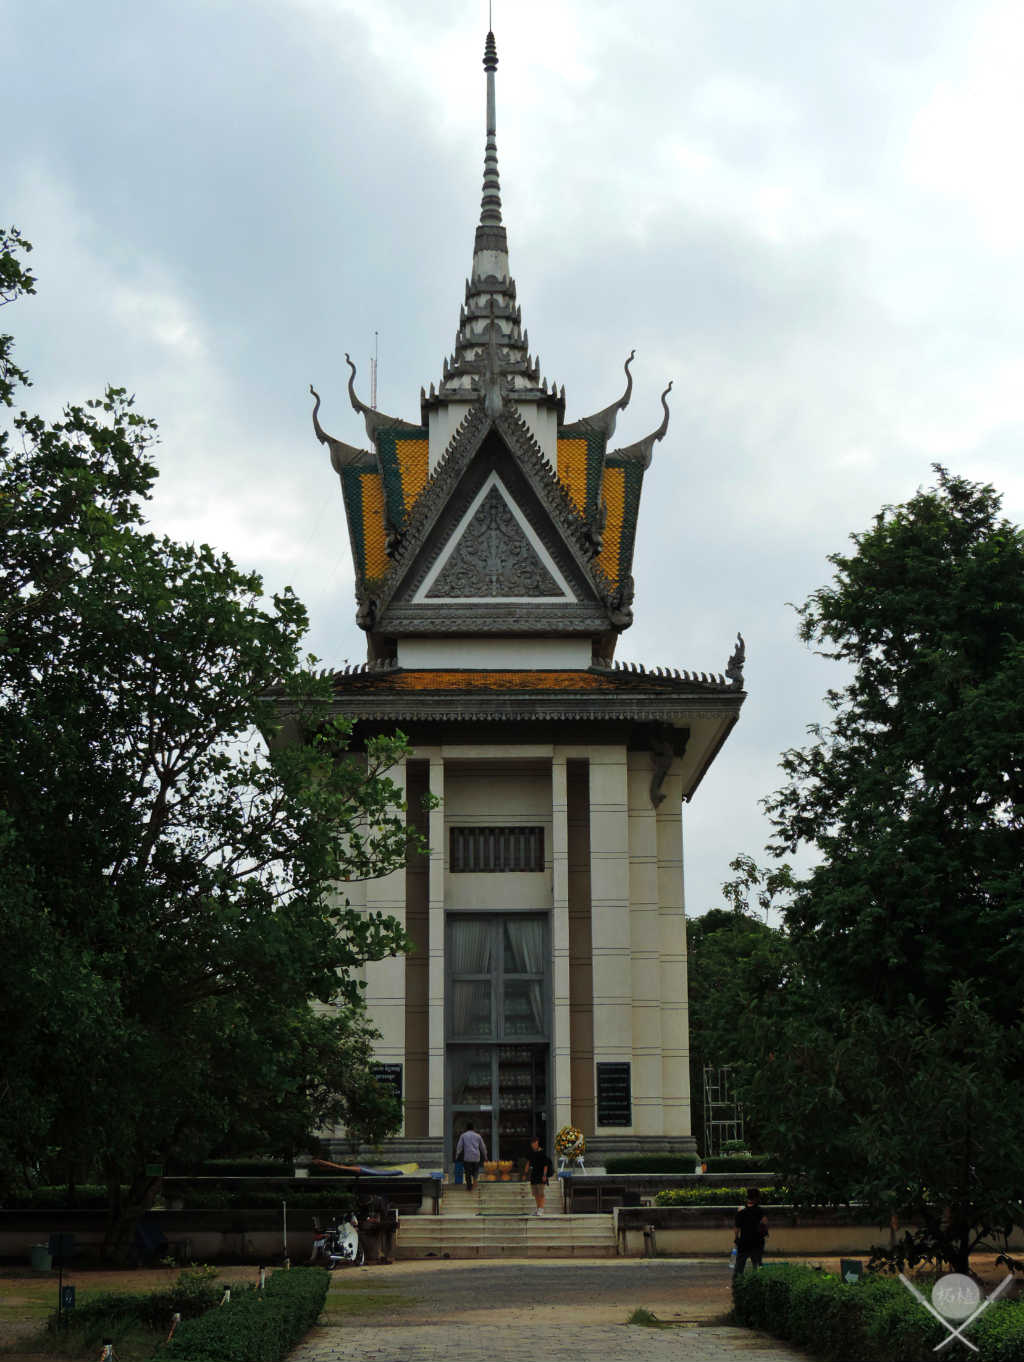 Camboja - Choeung Ek Phnom Penh - Viagem - Vida de Tsuge - VDT